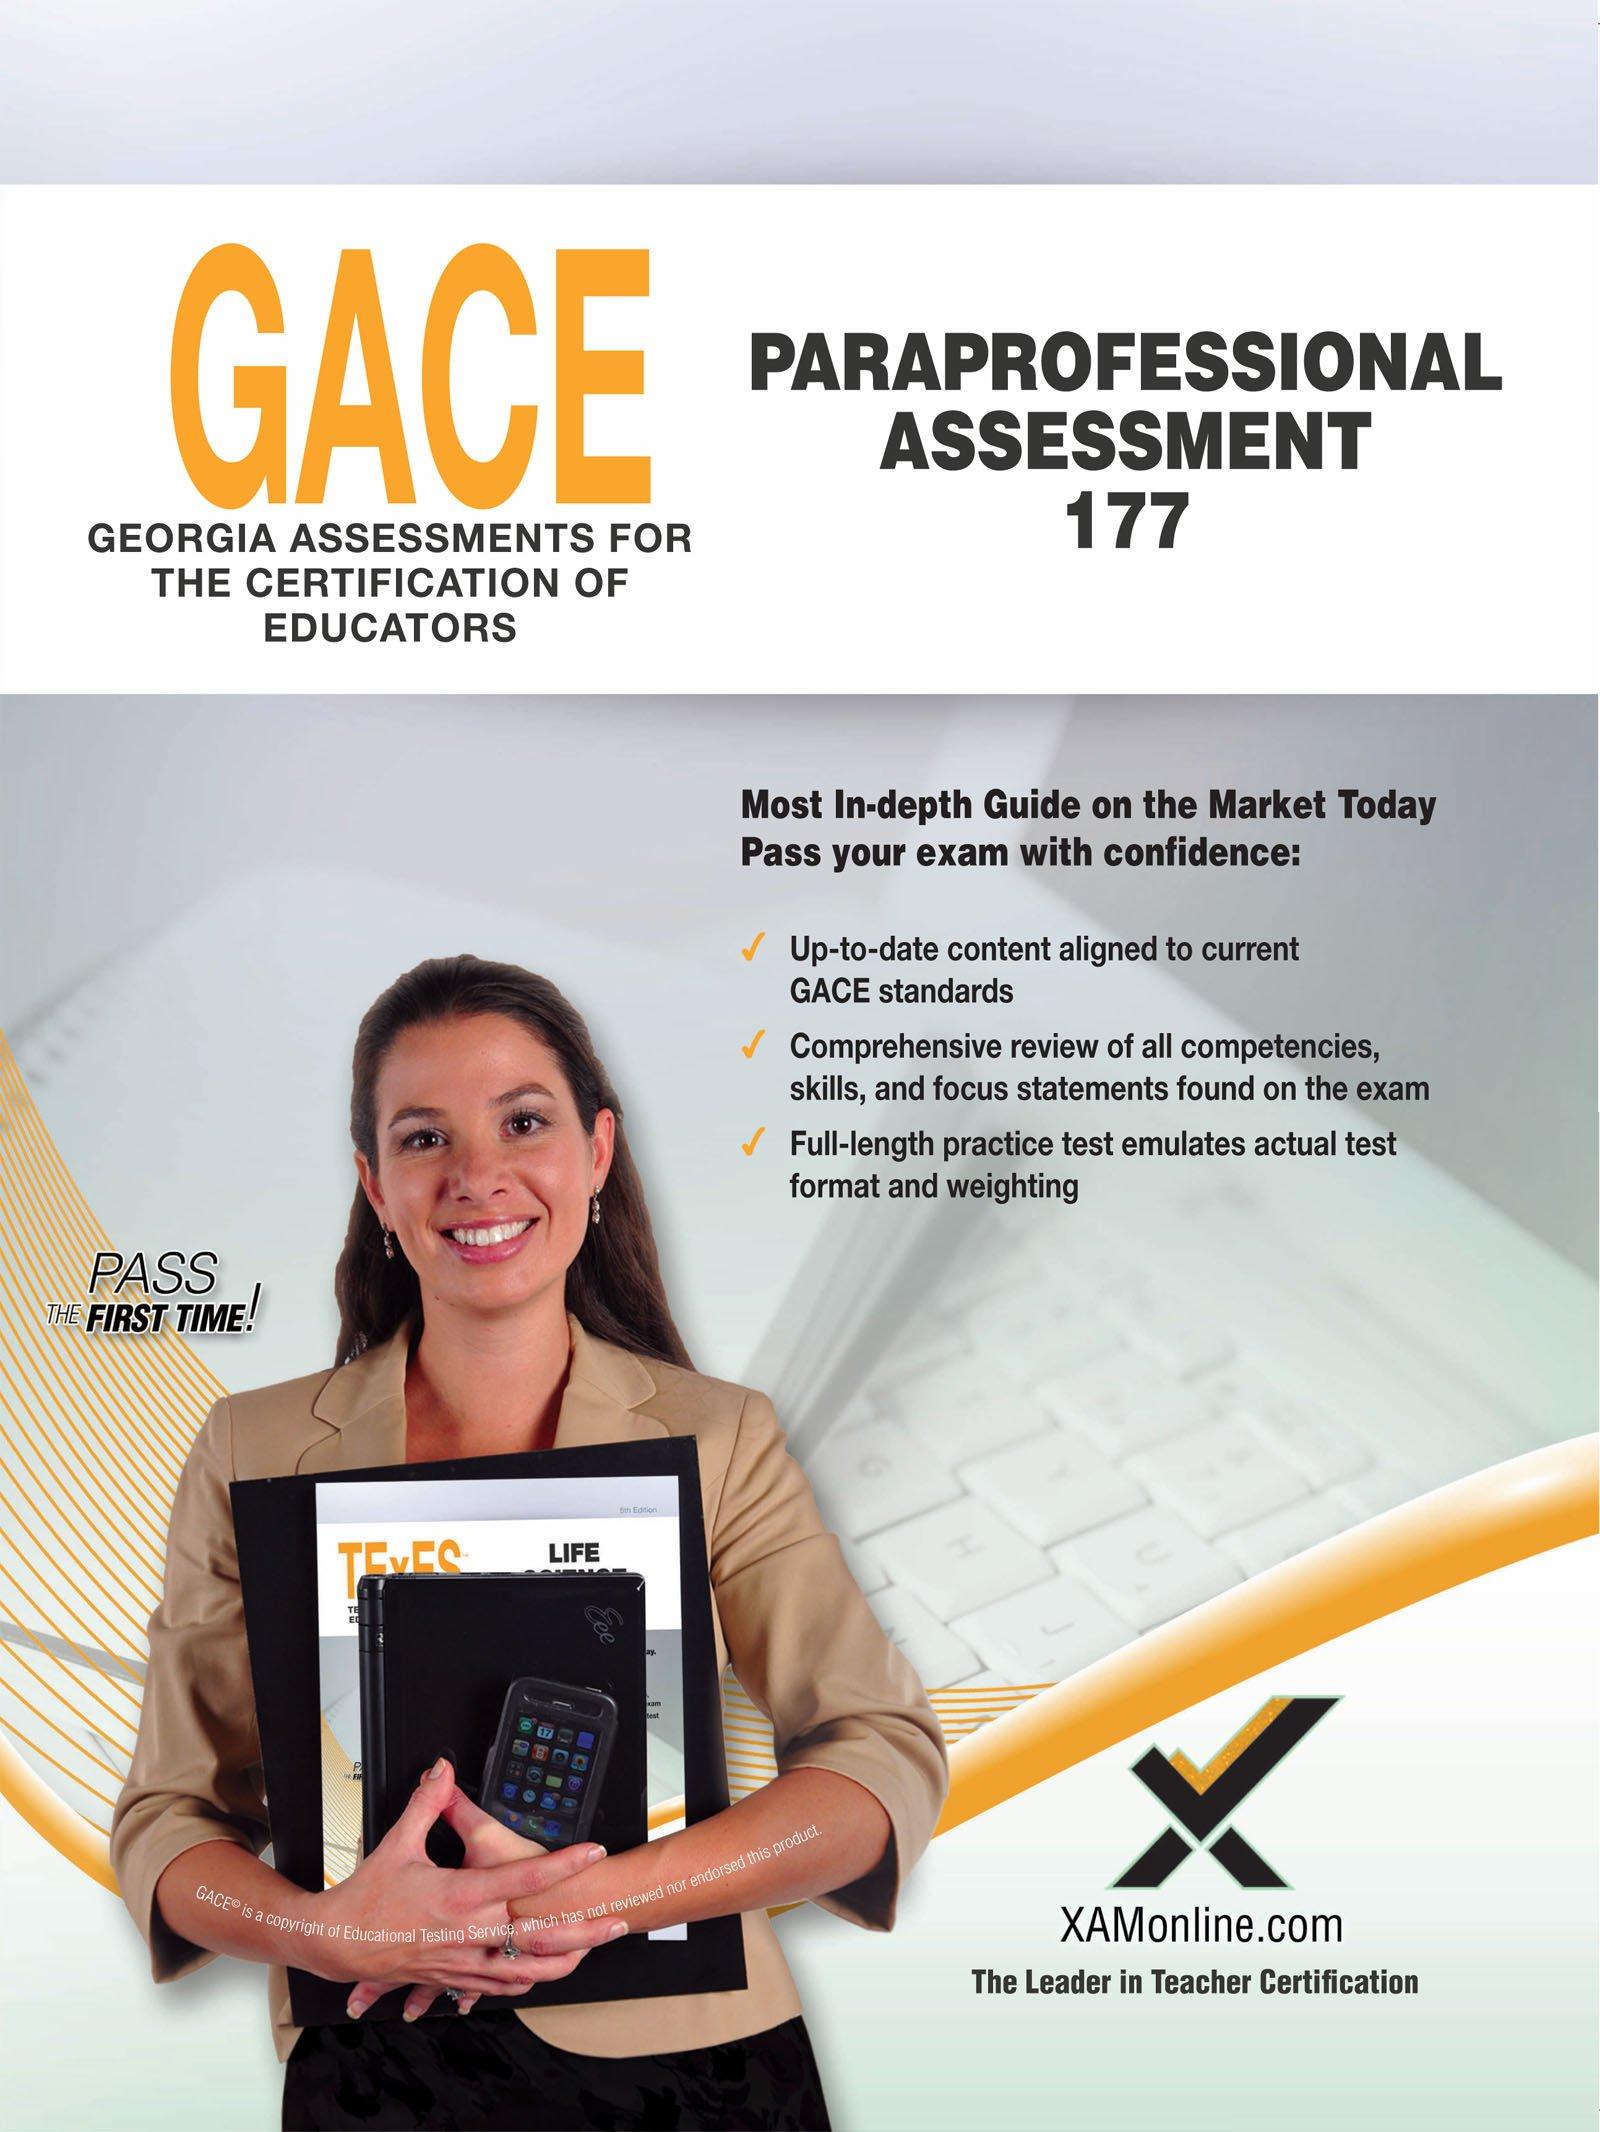 Gace Paraprofessional Assessment 177 Amazon Sharon A Wynne Books